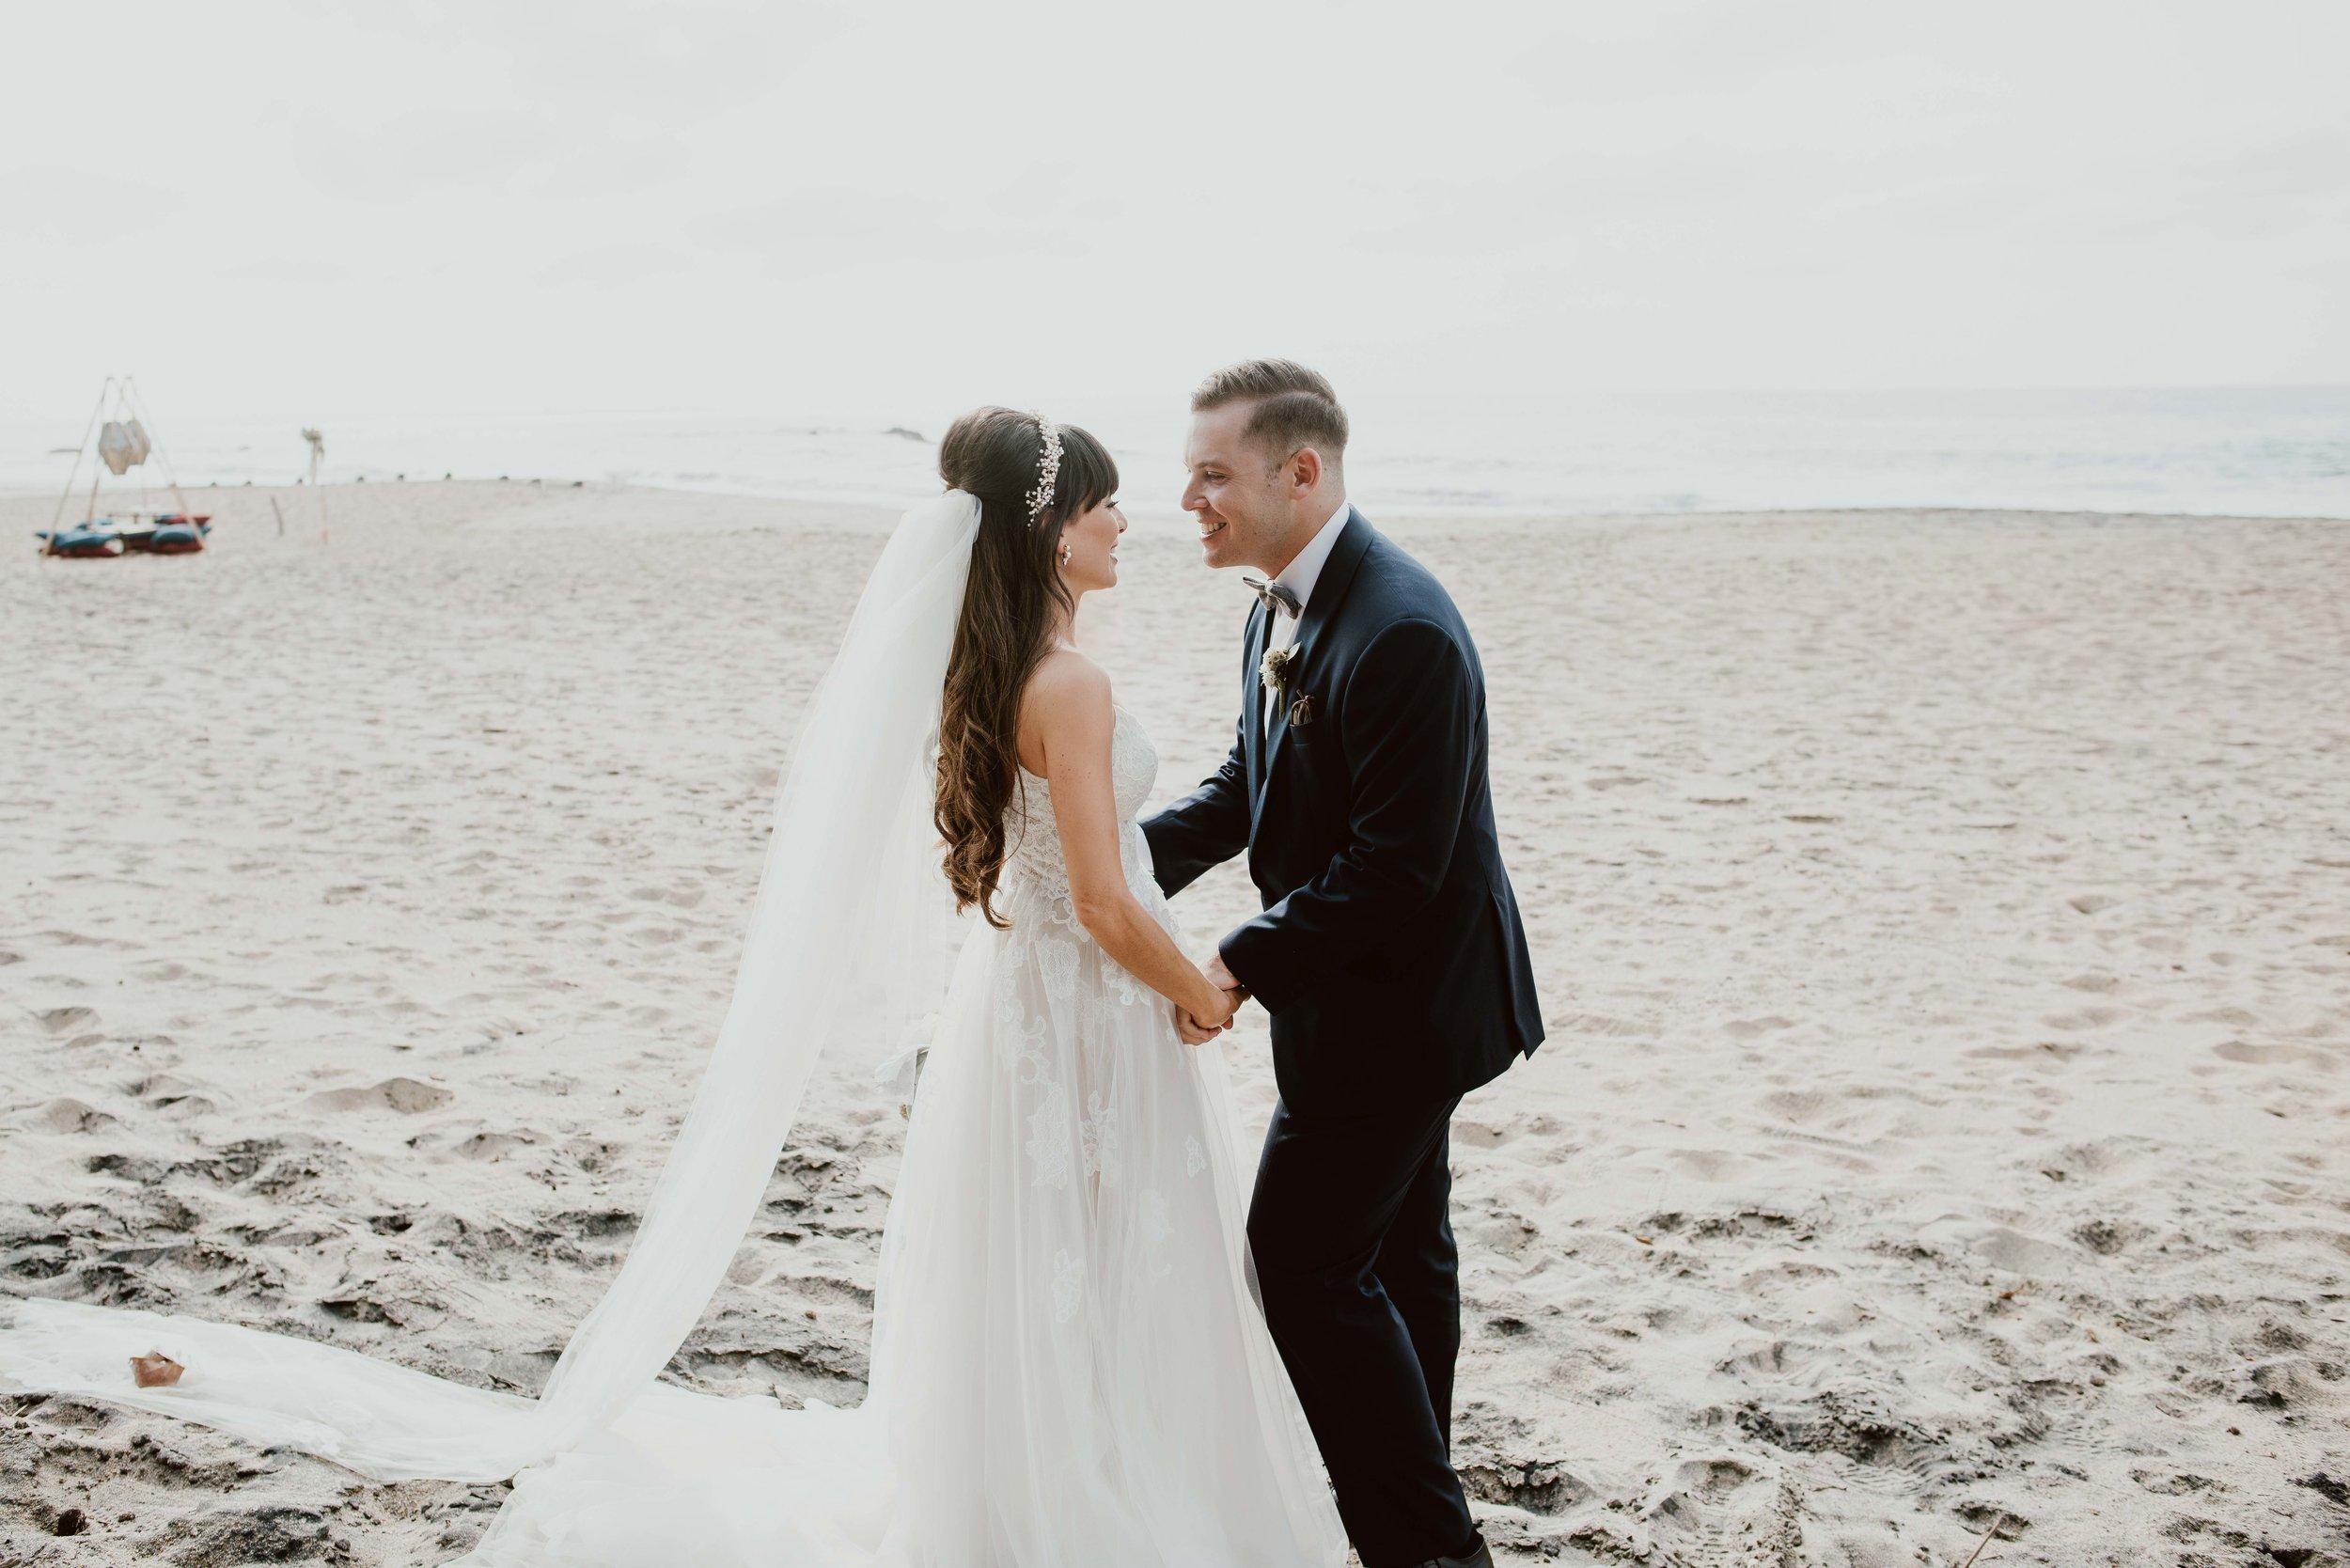 Mariana+Blake Sayulita Wedding-209.jpg